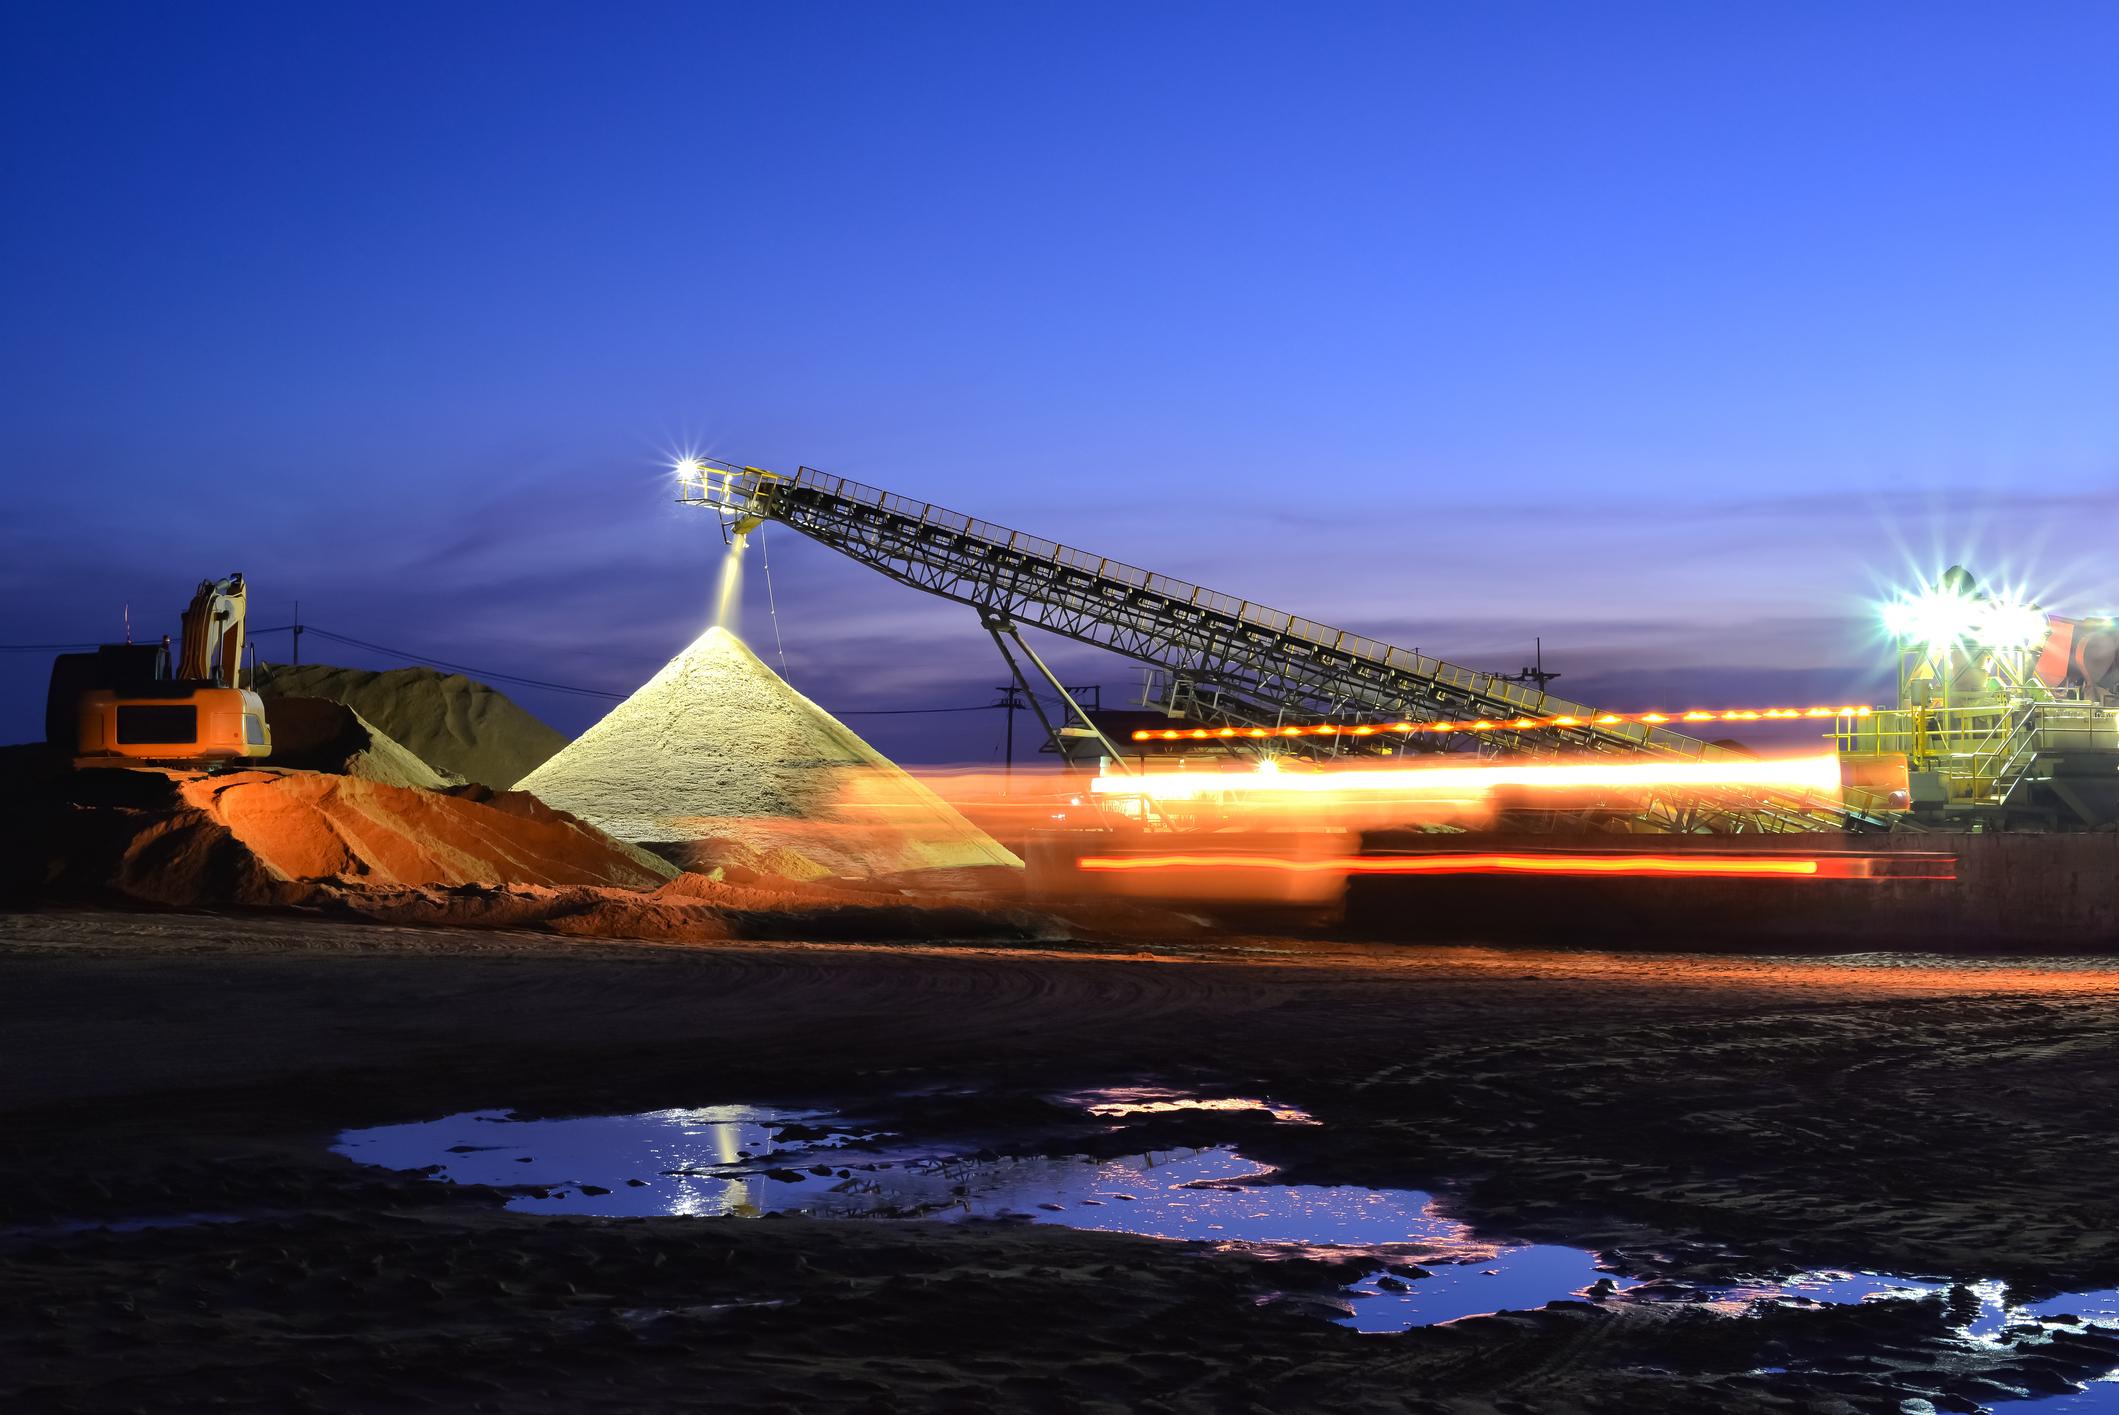 Sand mining night shift with sunset sky.